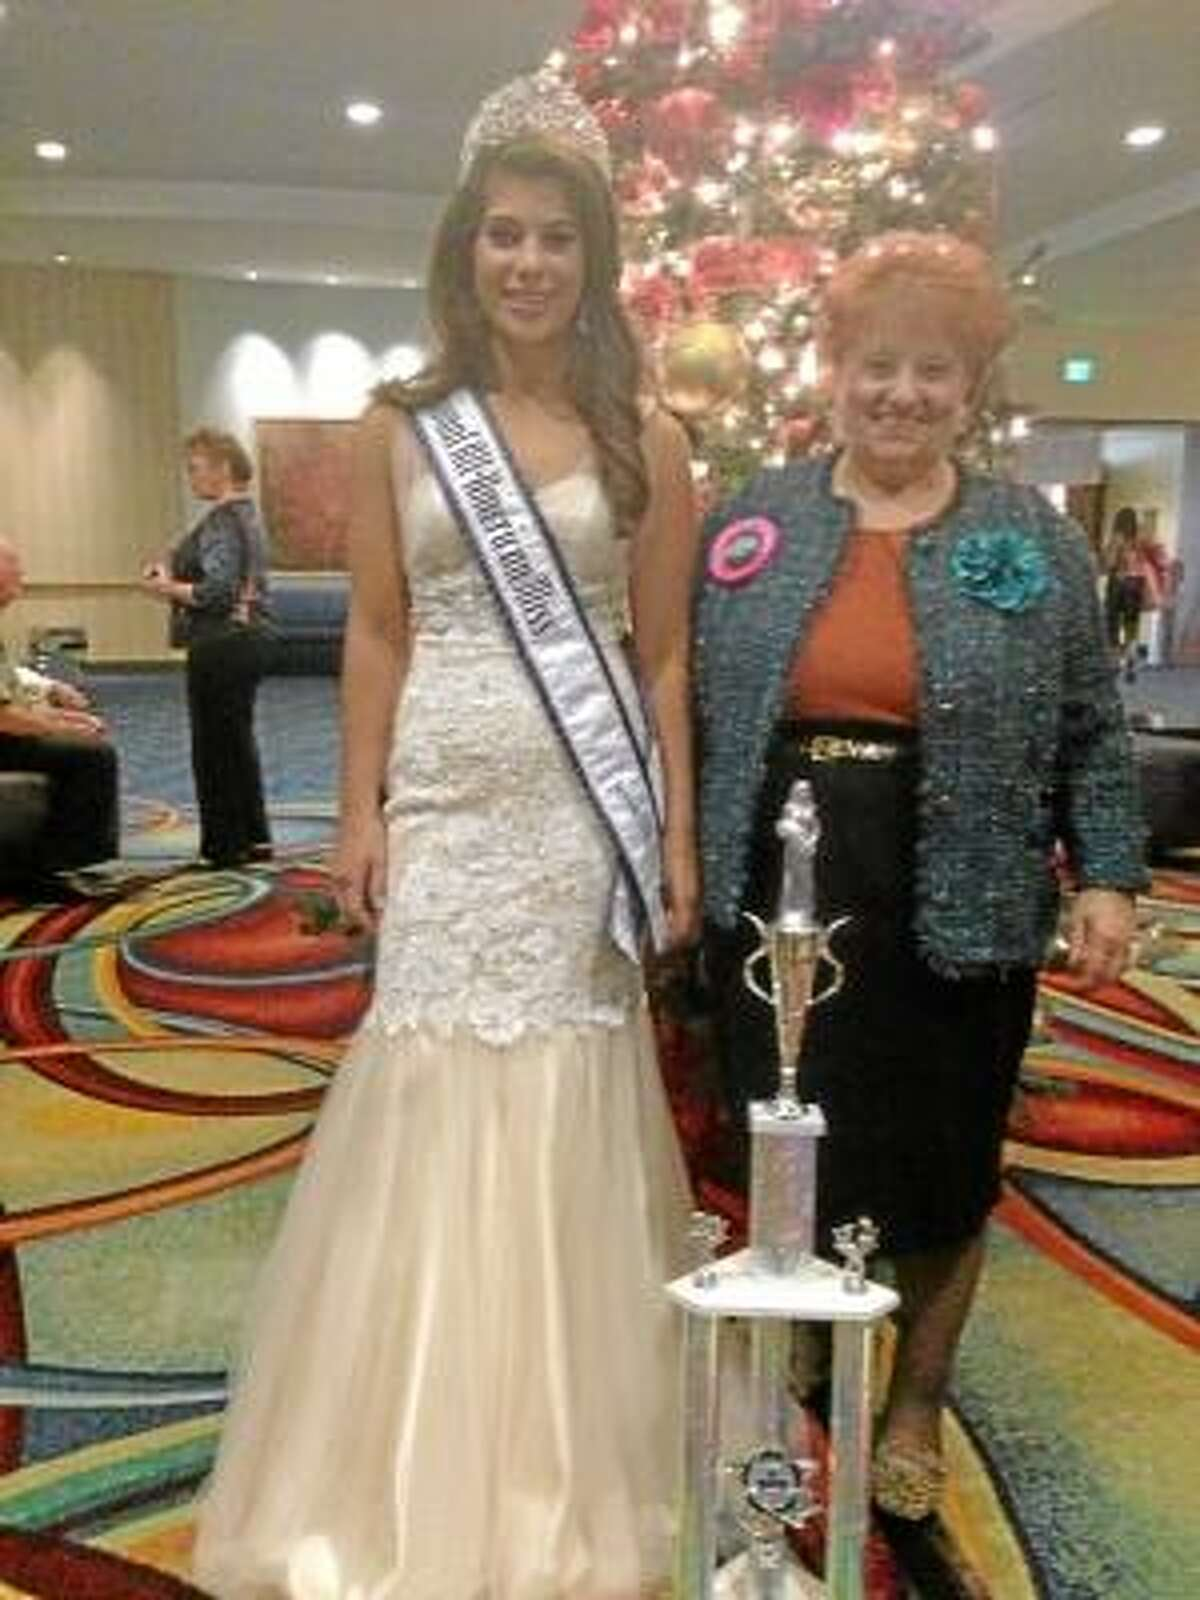 Savannah and grandmother Donna, November 2012 (Photo credit: Sandy Giammarco)